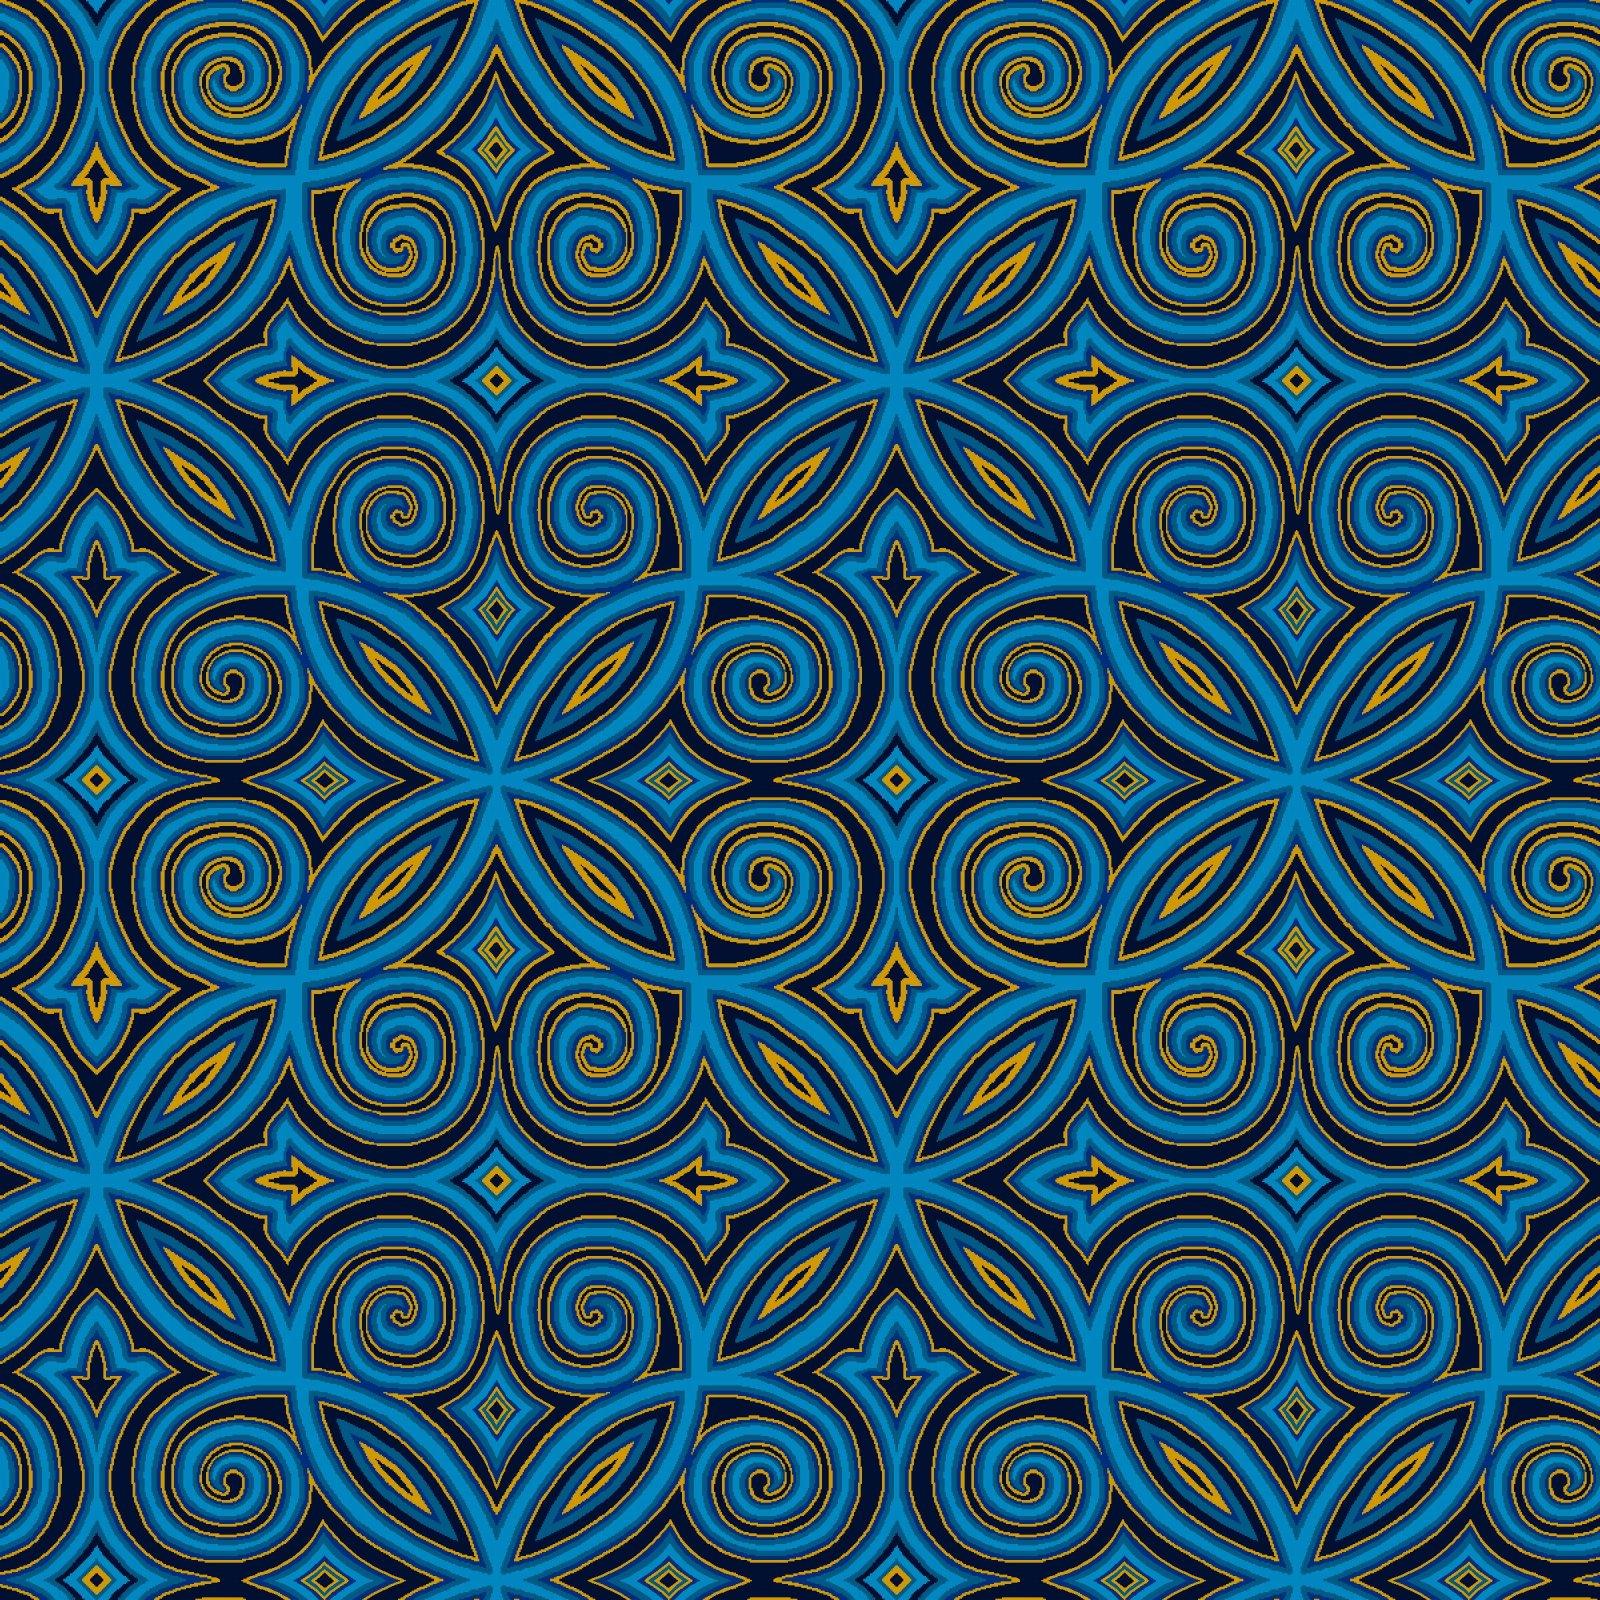 HG-Silent Night (Metallic) 2510M-77 Blue - Arabesque